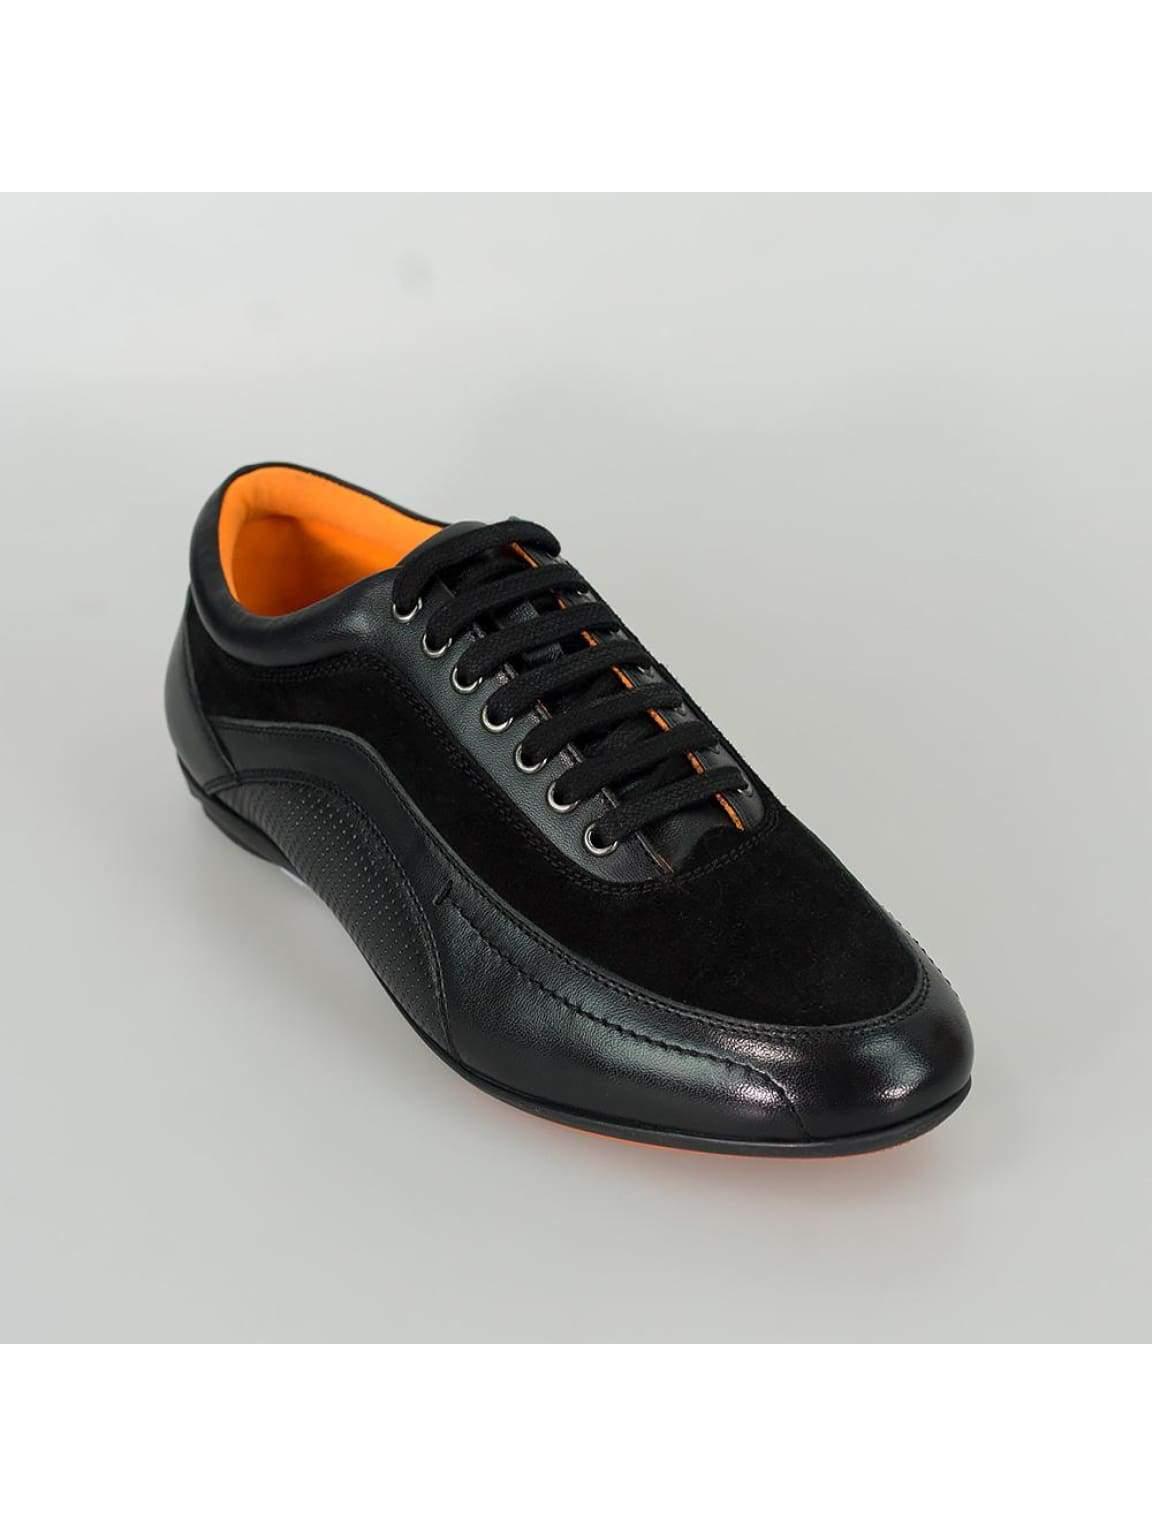 Cavani Brad Men's Black Fashion Shoes